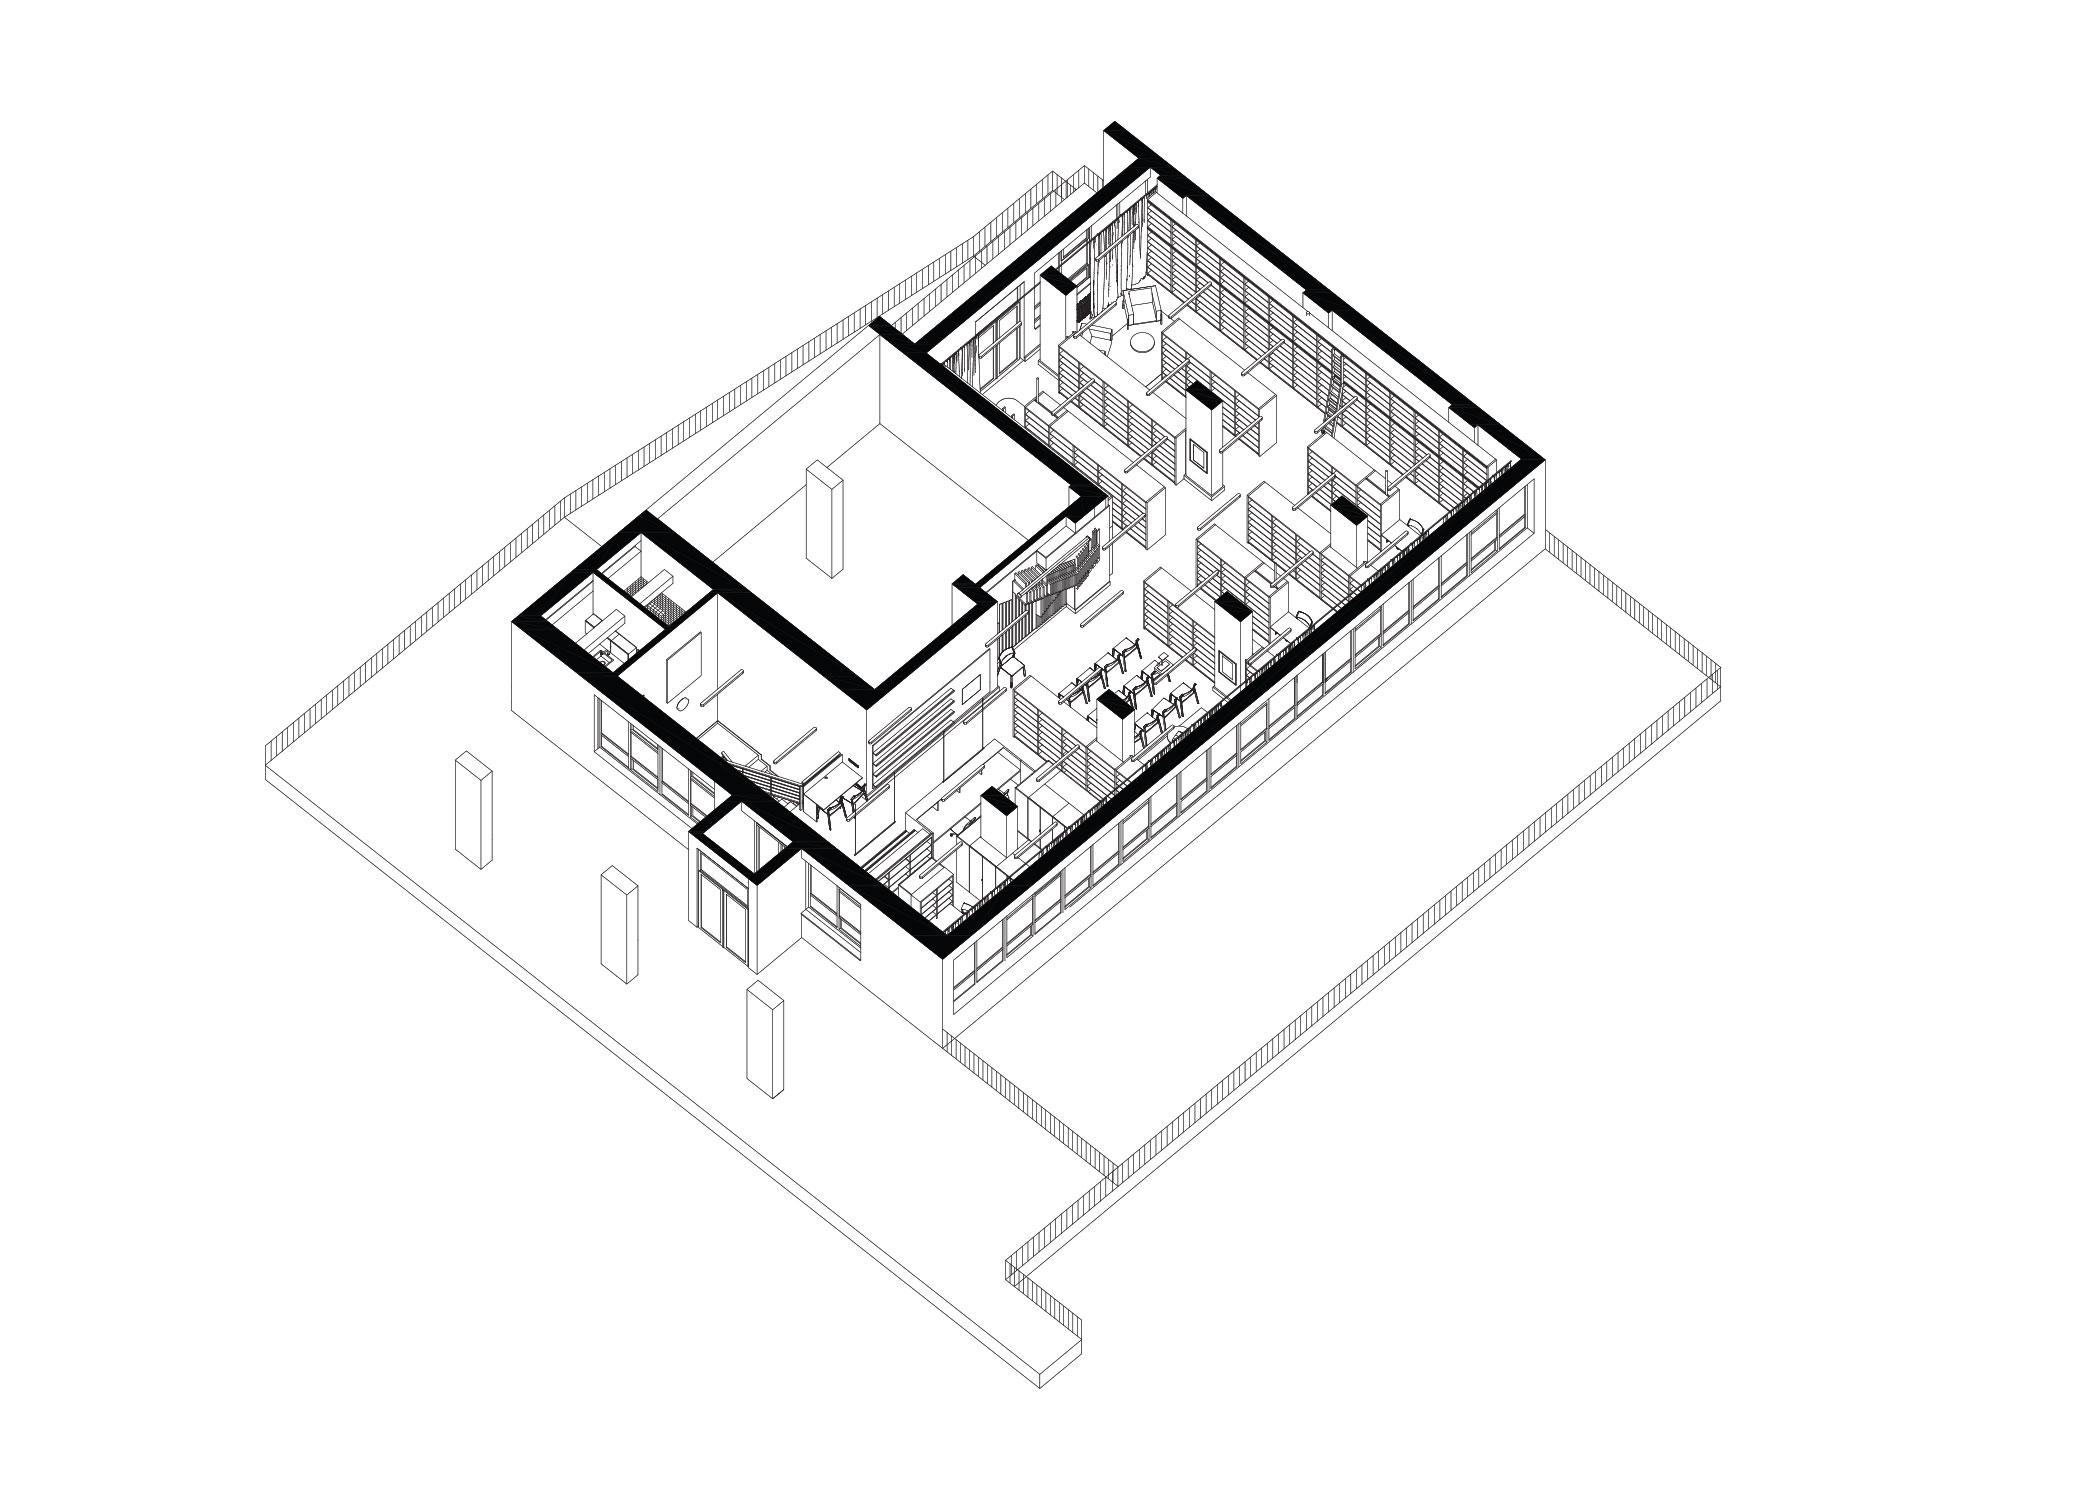 noiz-architekti-bratislava-kniznica-petrzalka-vavilovova-05